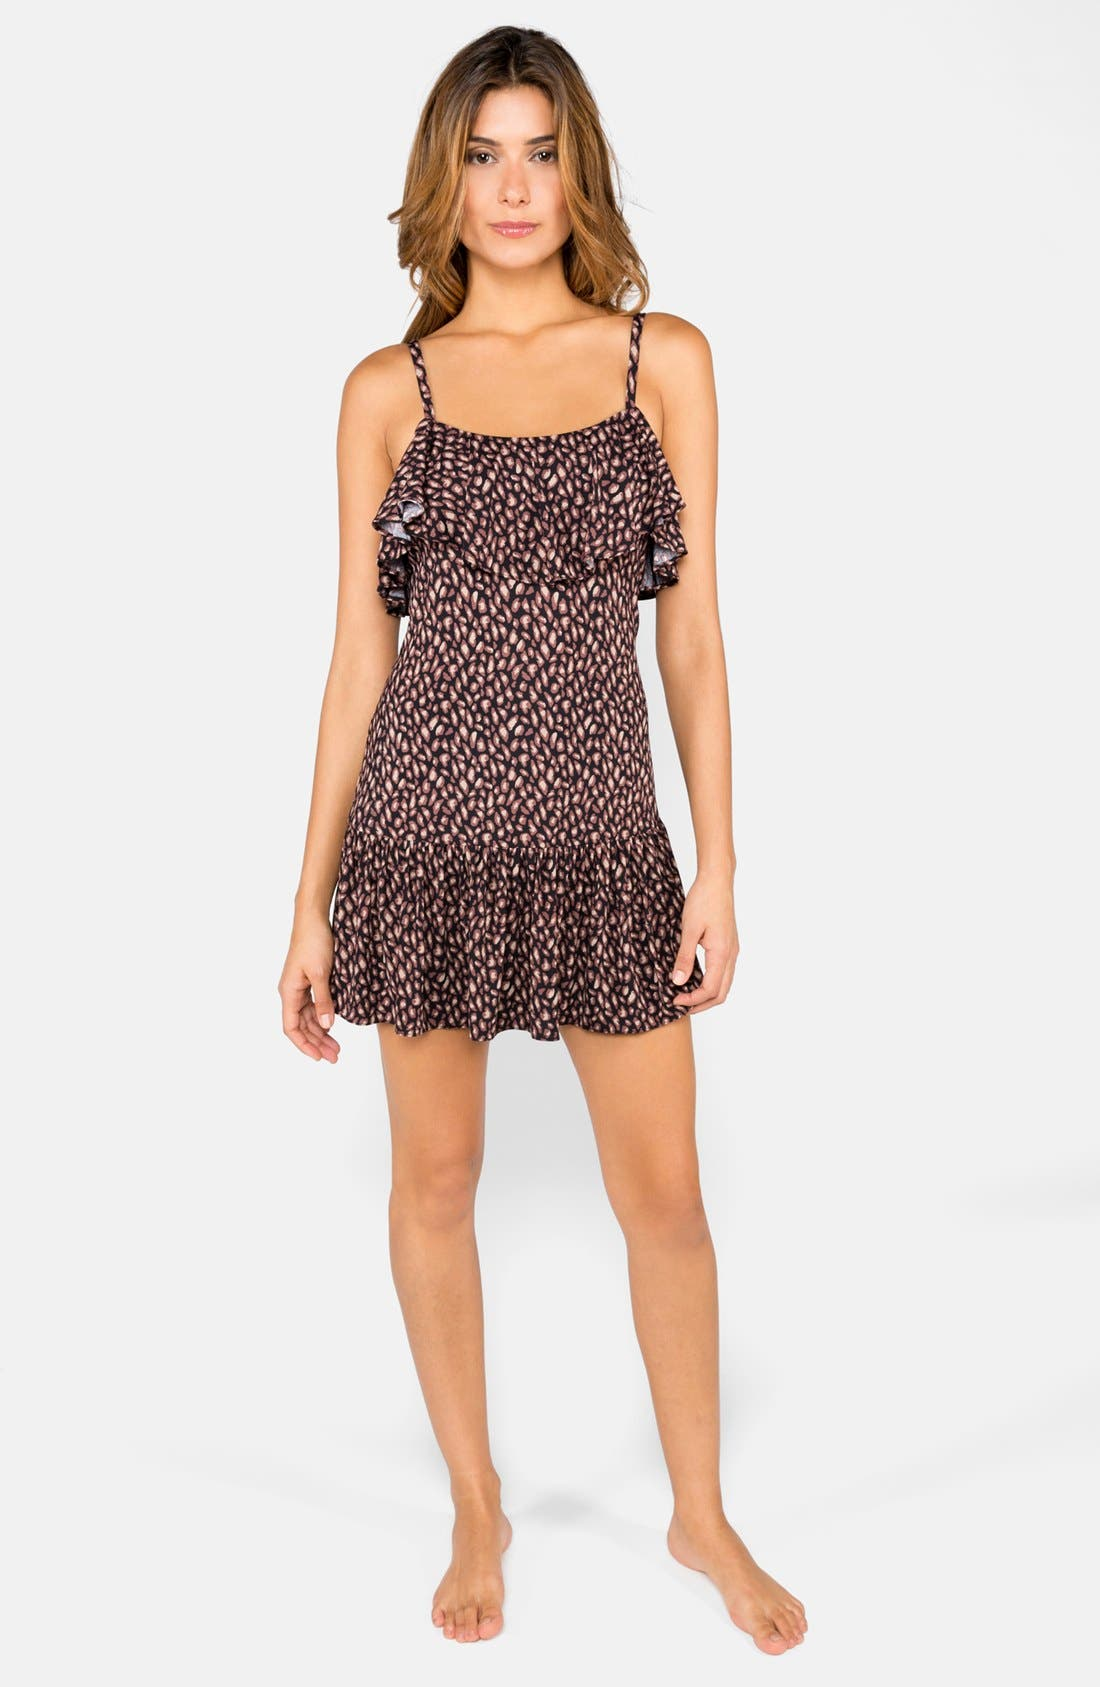 Alternate Image 1 Selected - DKNY 'Mini Animal' Ruffle Cover-Up Dress